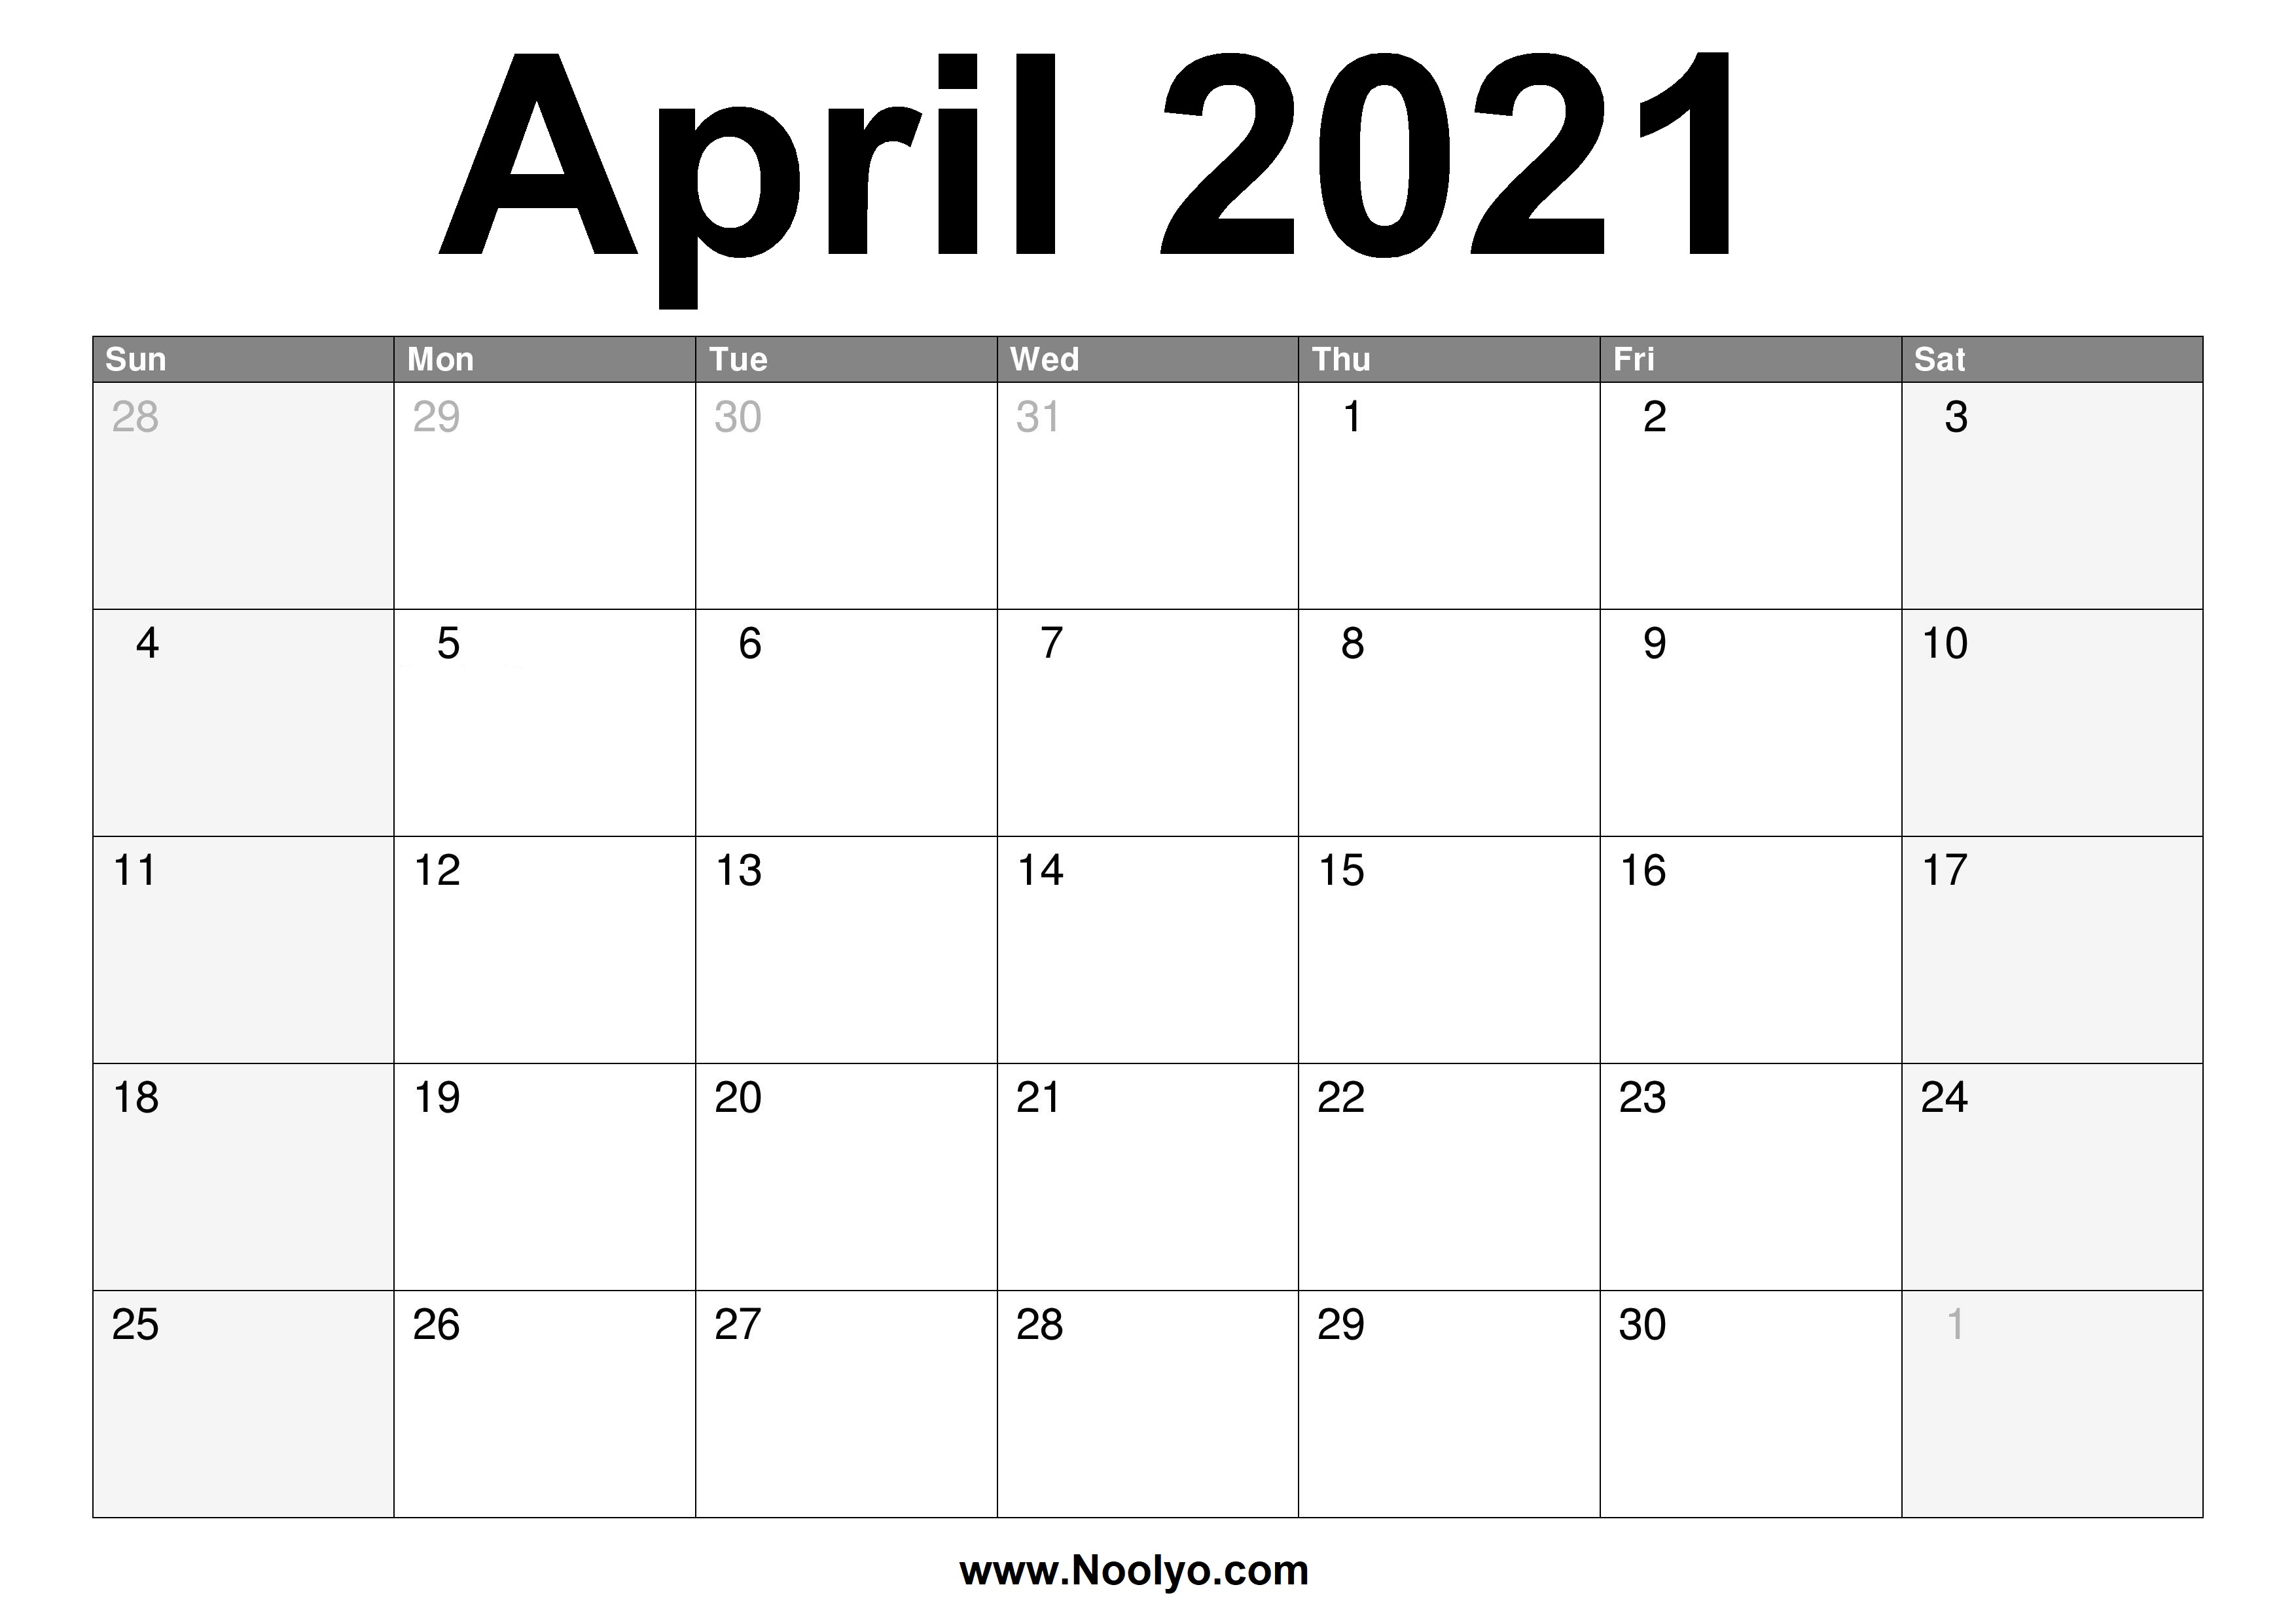 April 2021 Monthly Calendar | Calendar 2021